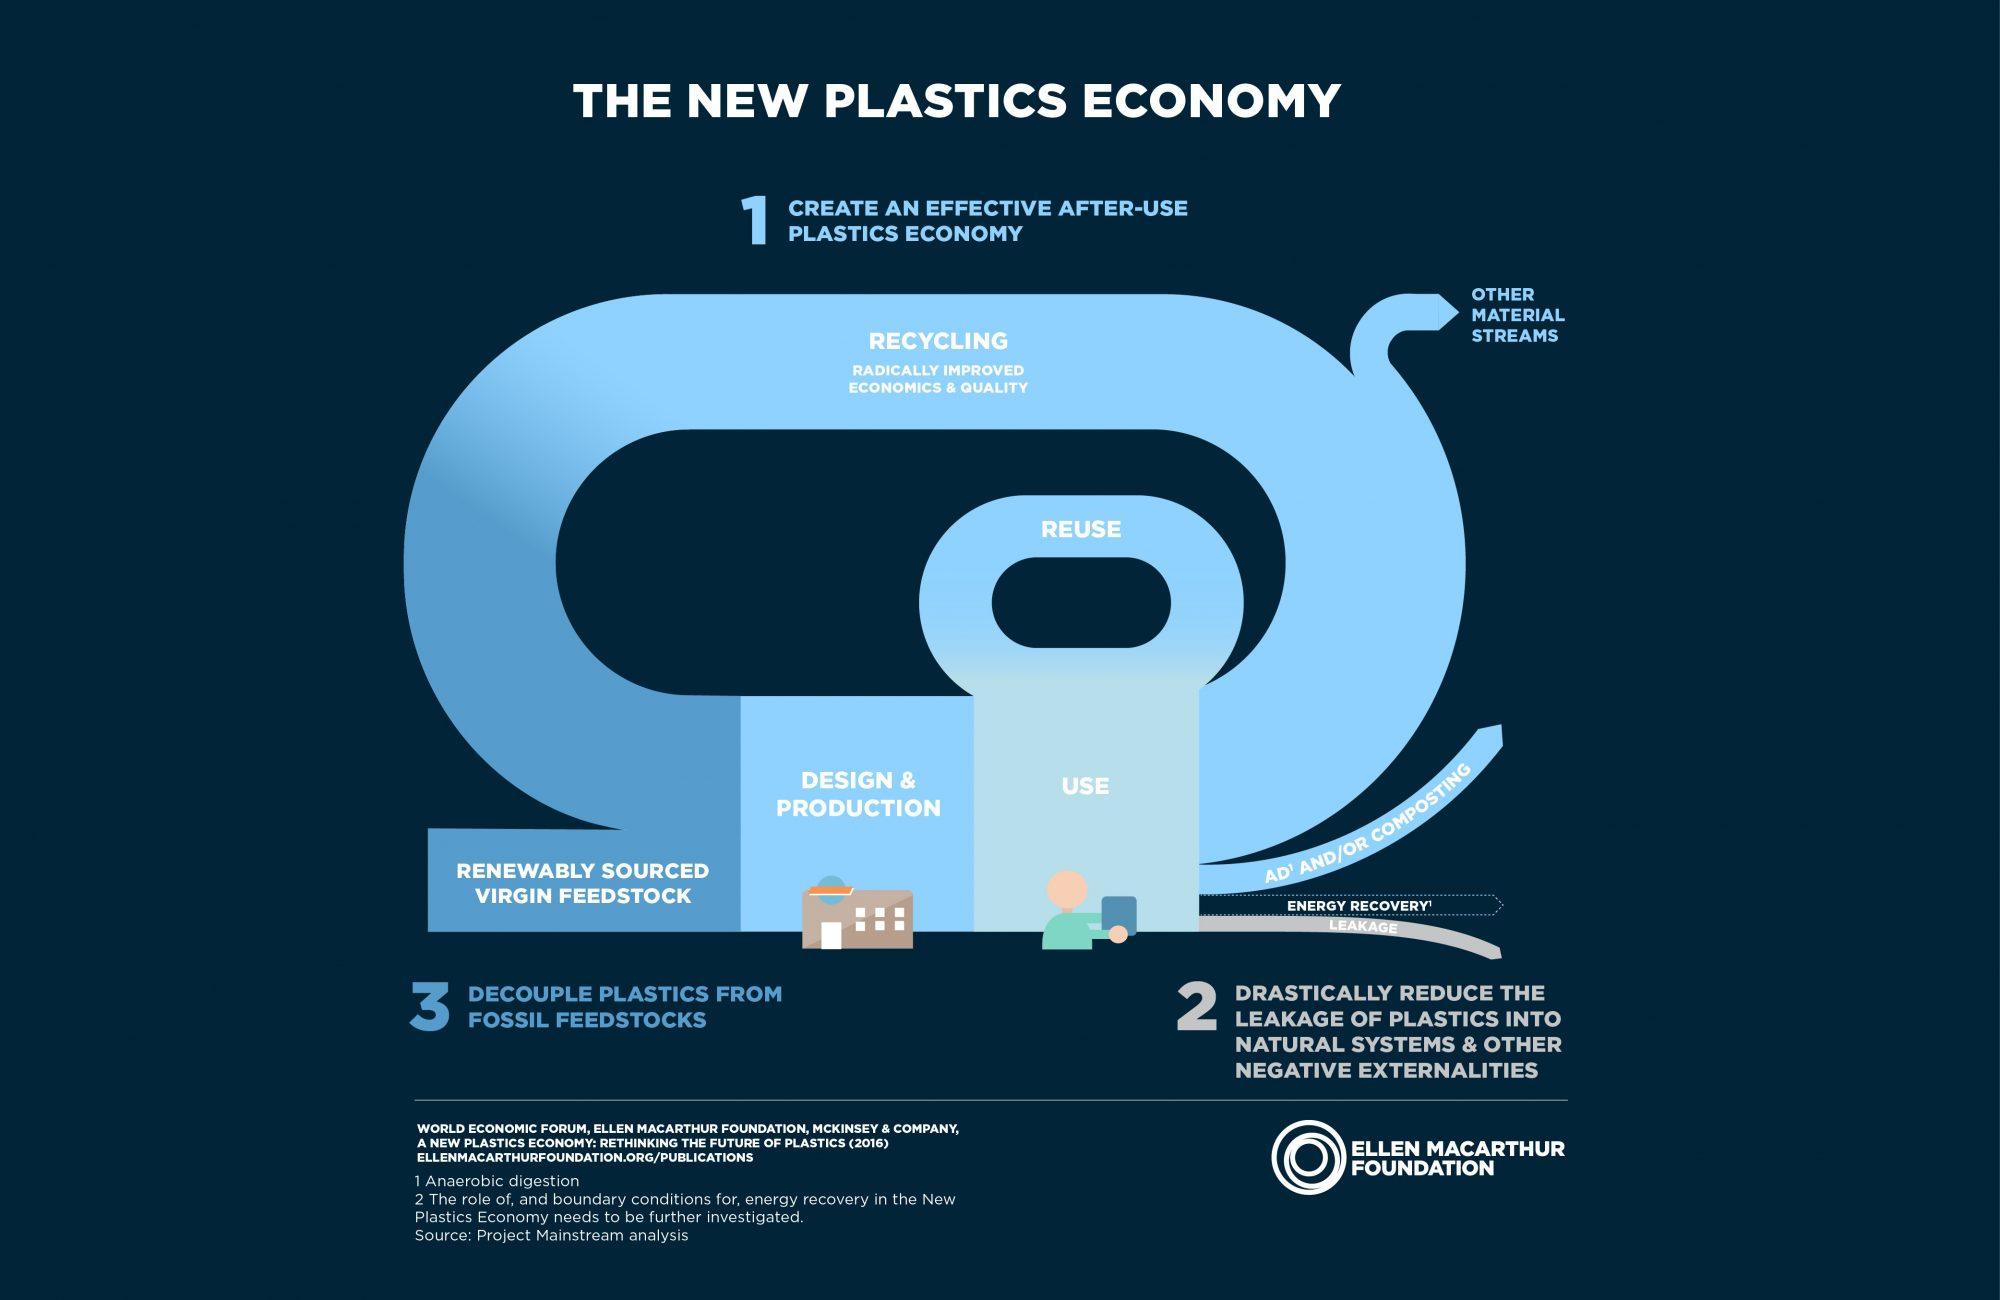 PepsiCo targets 50 percent rPET in plastic bottles across EU